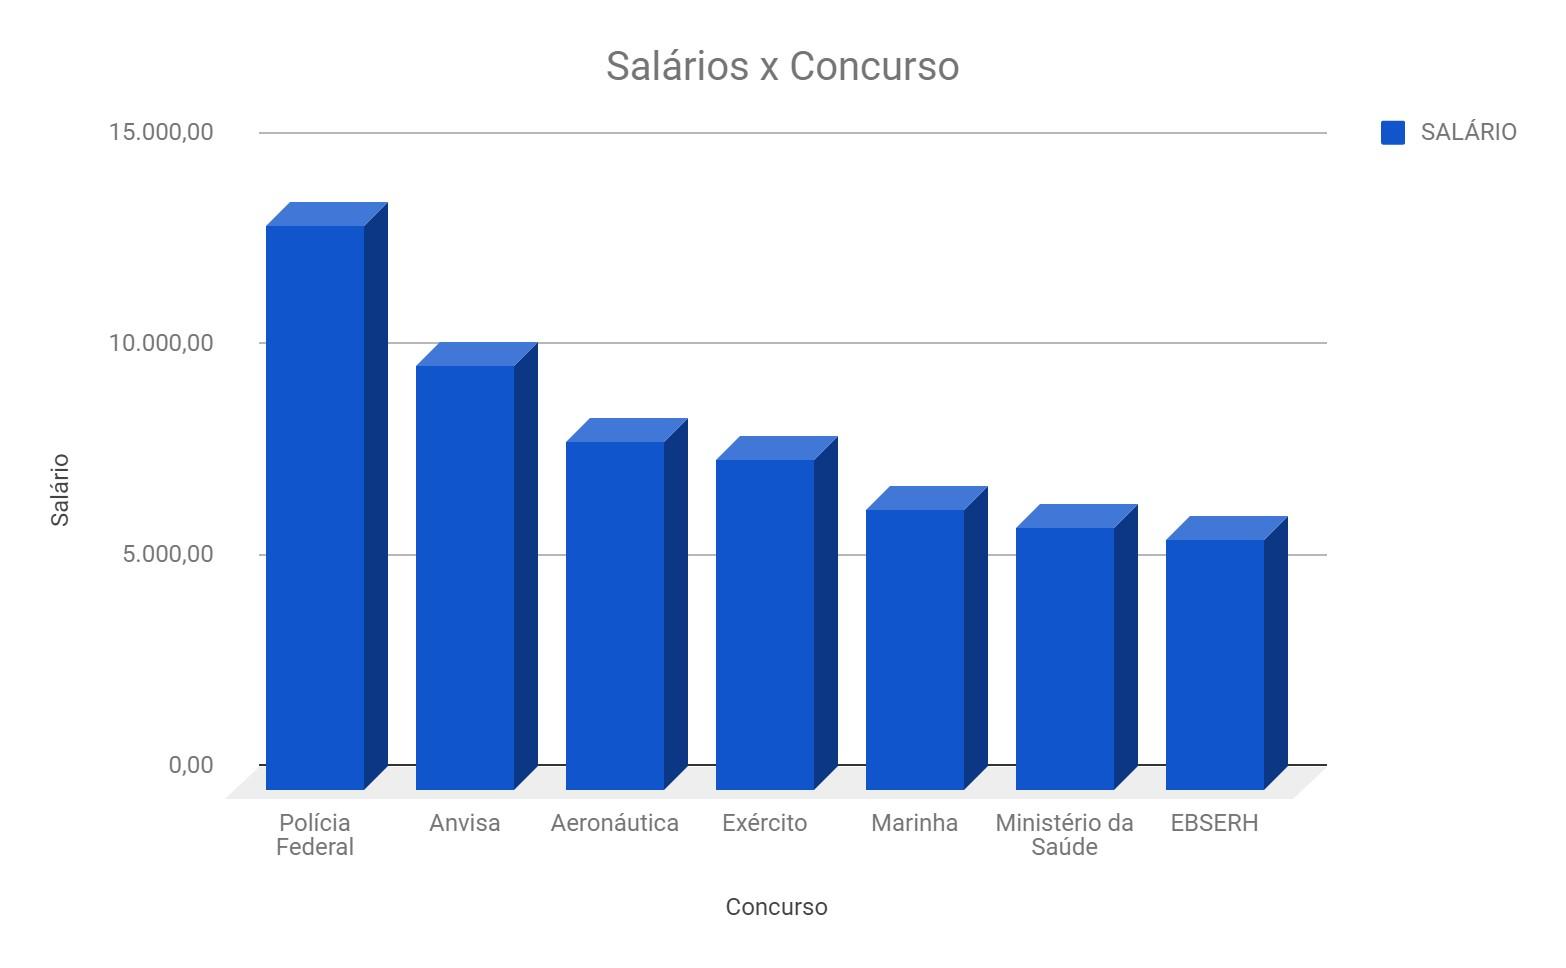 salarios dos melhores concursos para farmaceuticos.jpg (81 KB)